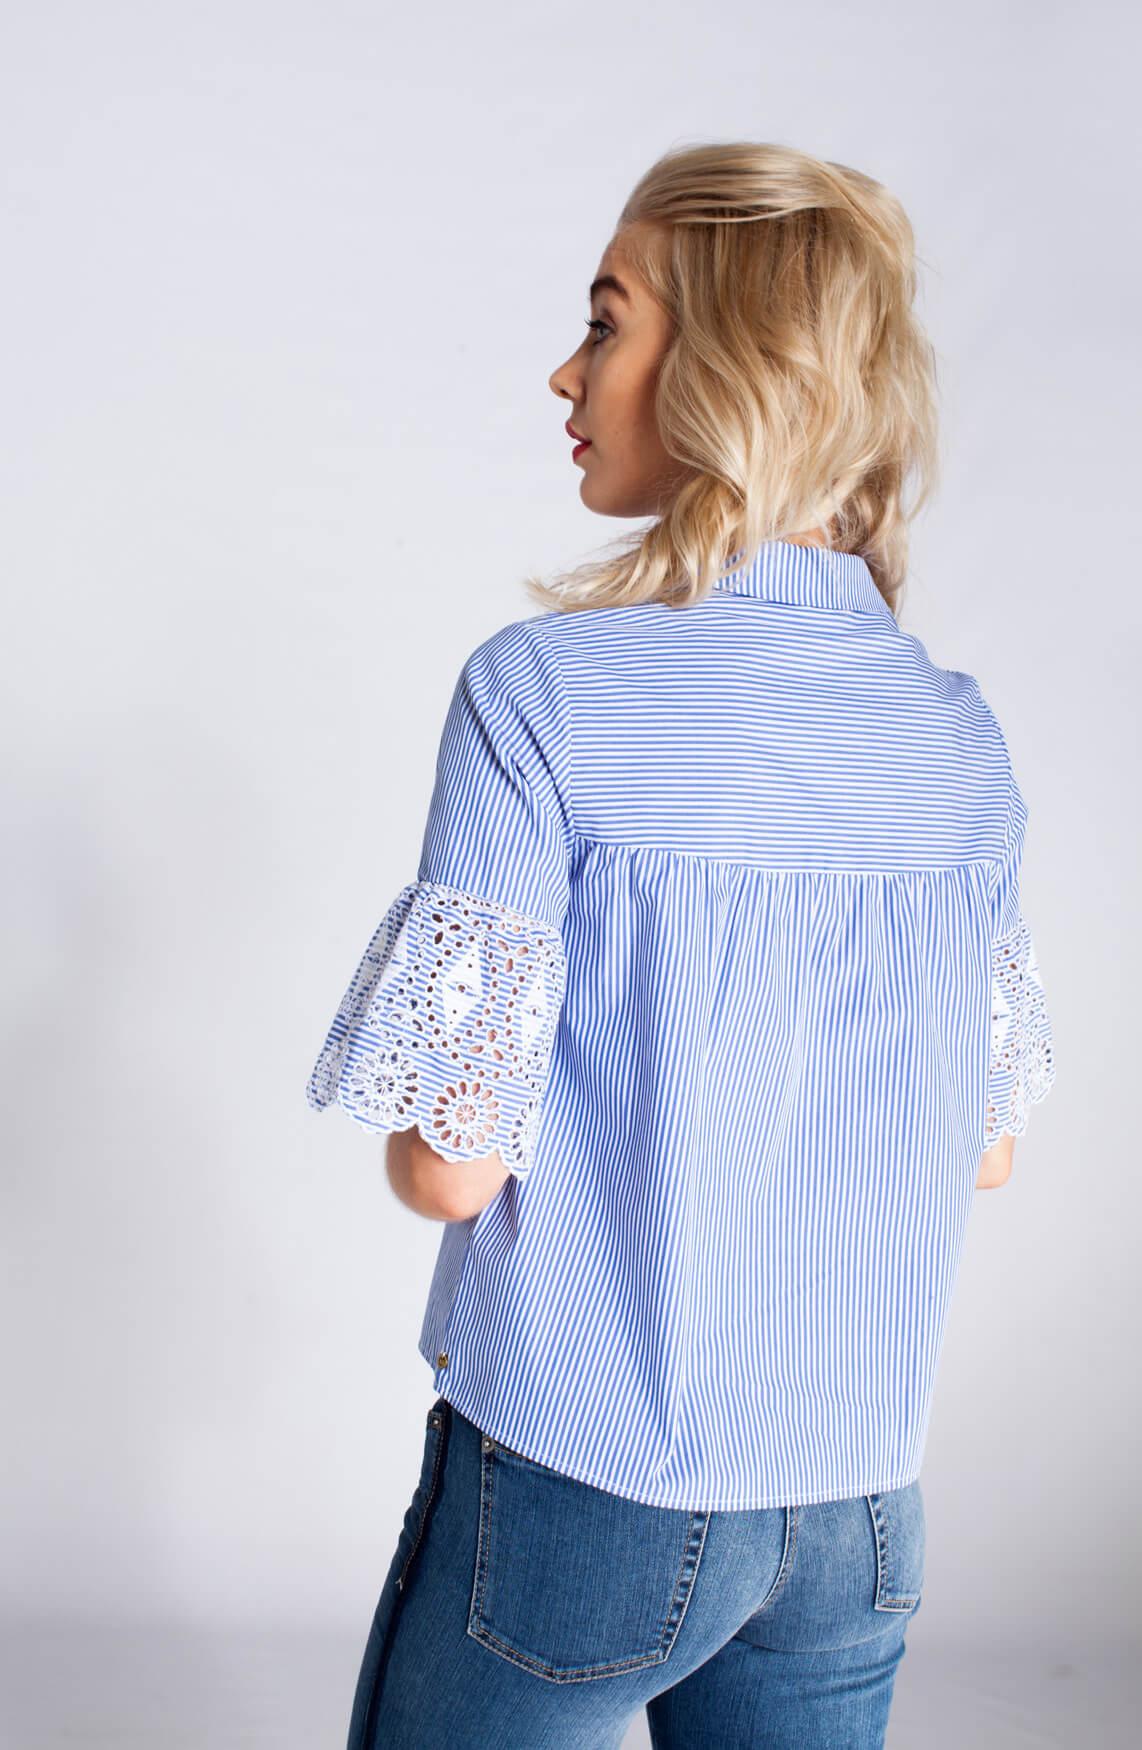 Maison Scotch Dames Gestreepte blouse Blauw